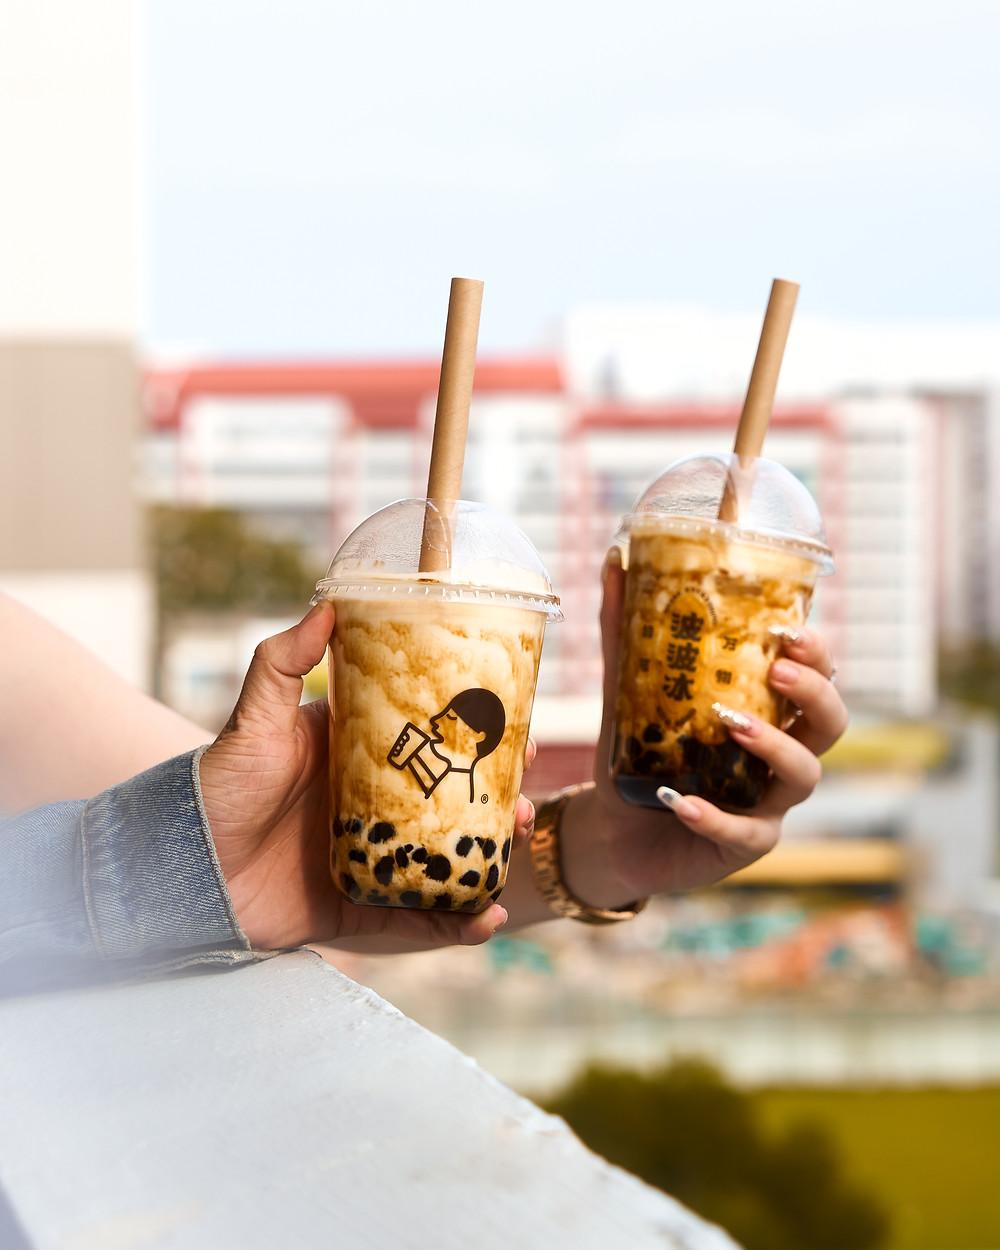 A shot for Hey Tea Singapore at a housing block at Tampines HDB TV Mural Art. A shot of Hey Tea's Brown Sugar Bubble Tea